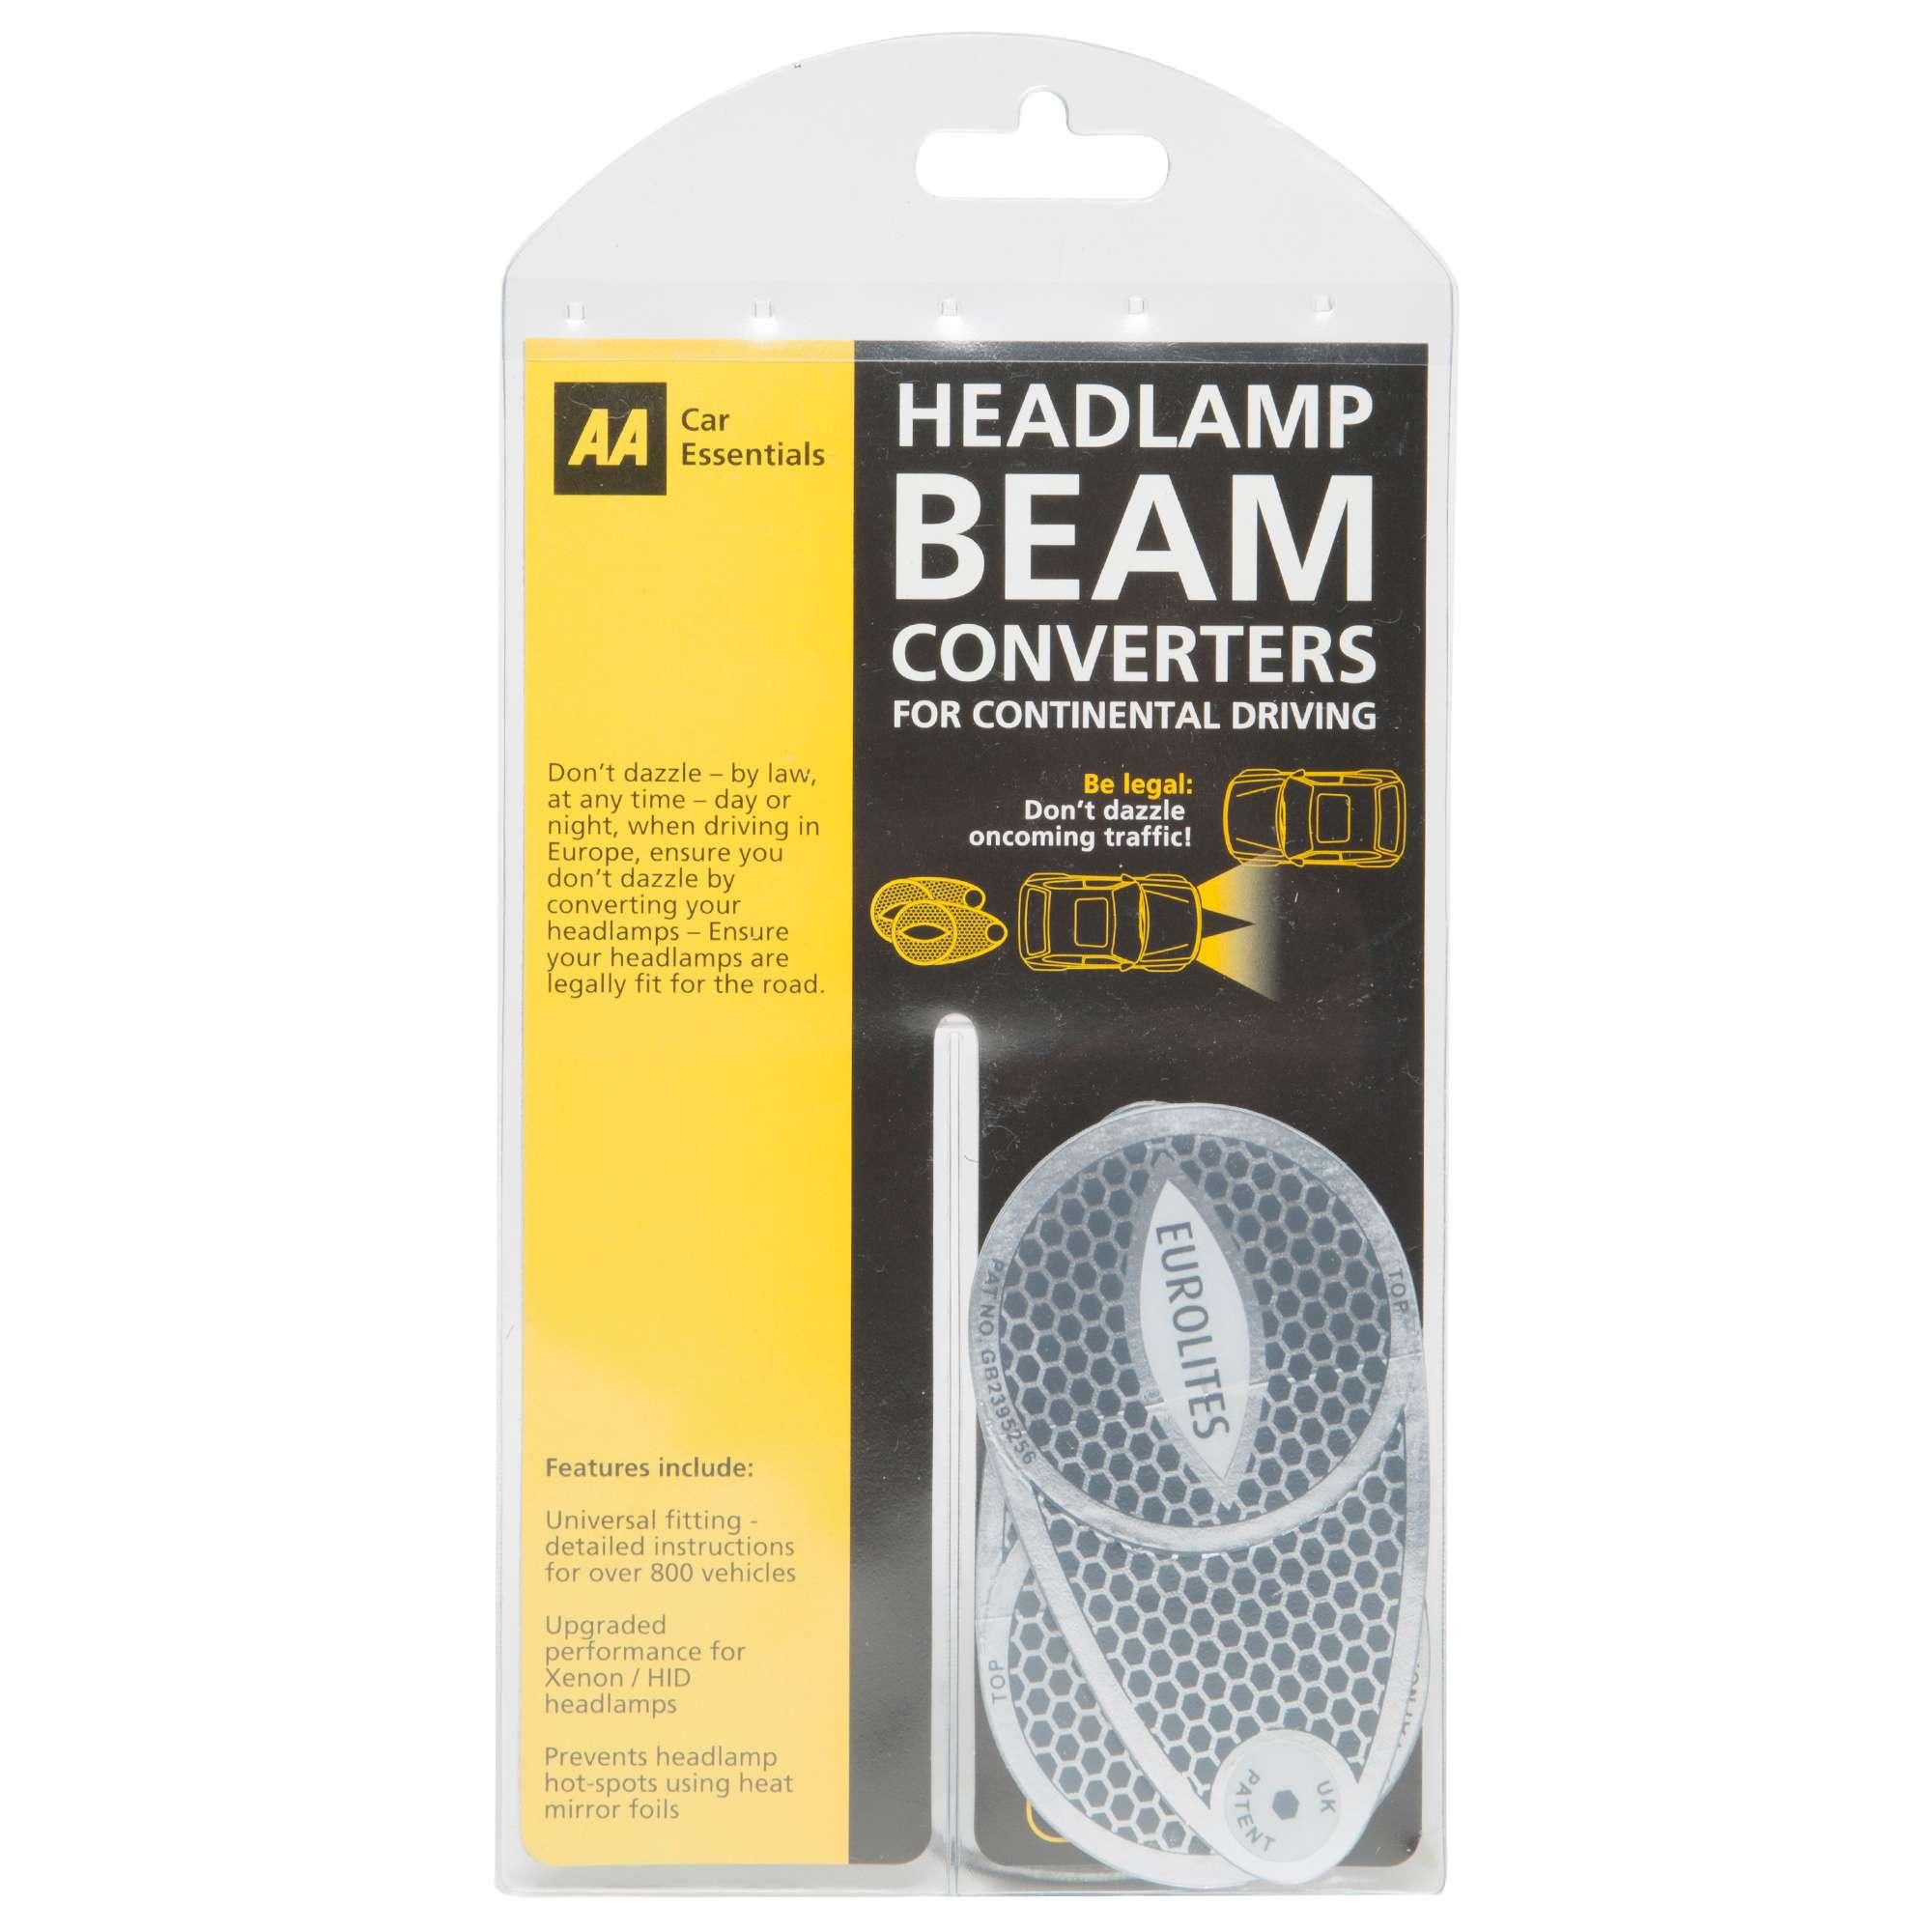 AA Headlamp Beam Converters